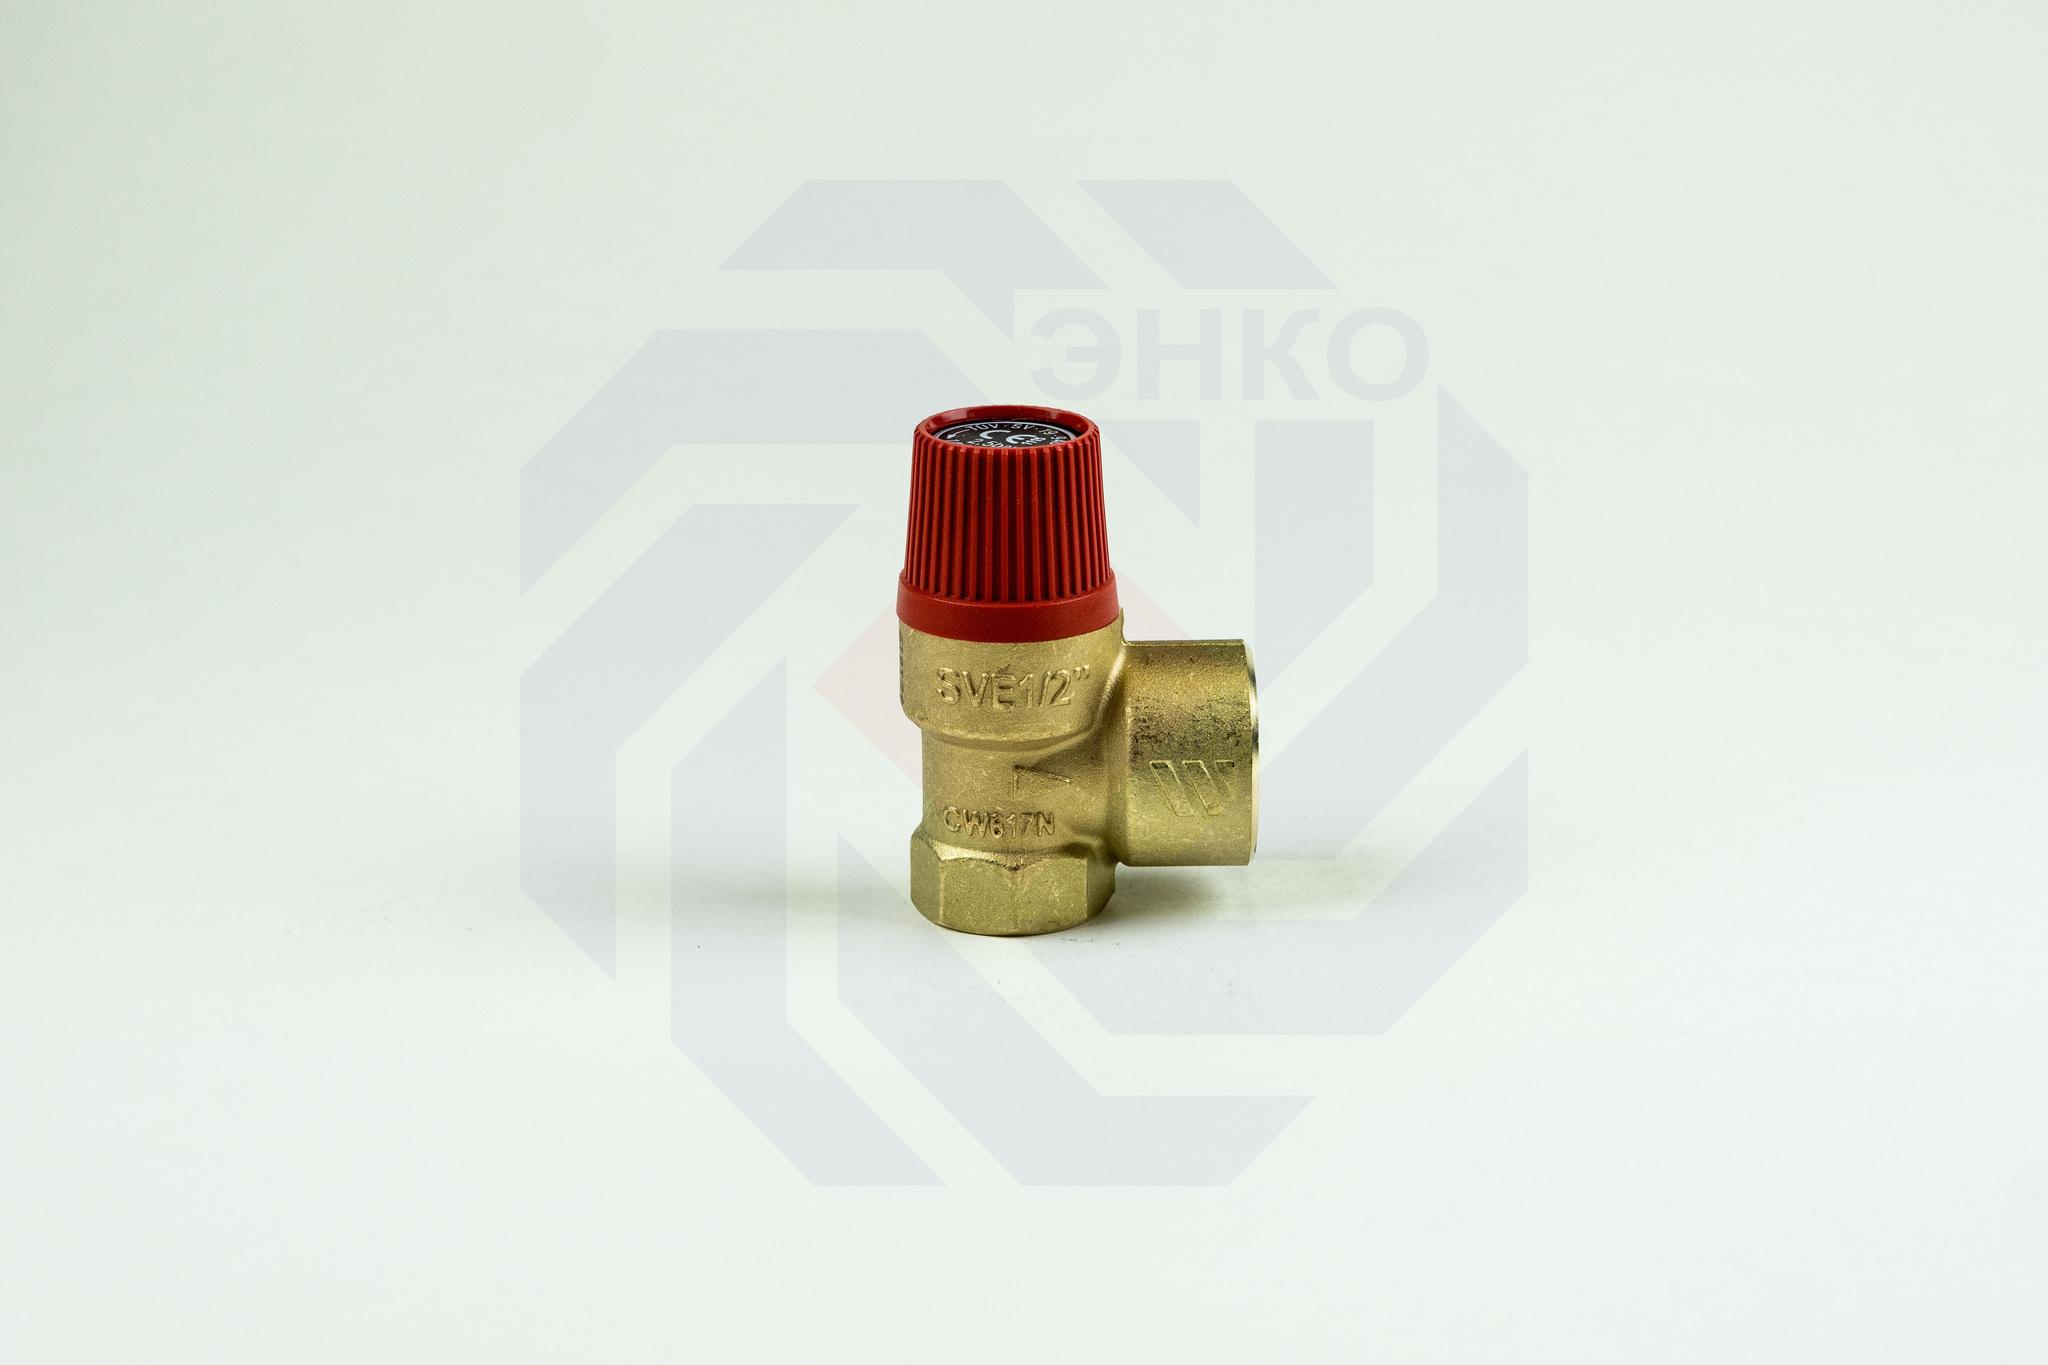 Клапан предохранительный WATTS SVH 2,5 бар ½